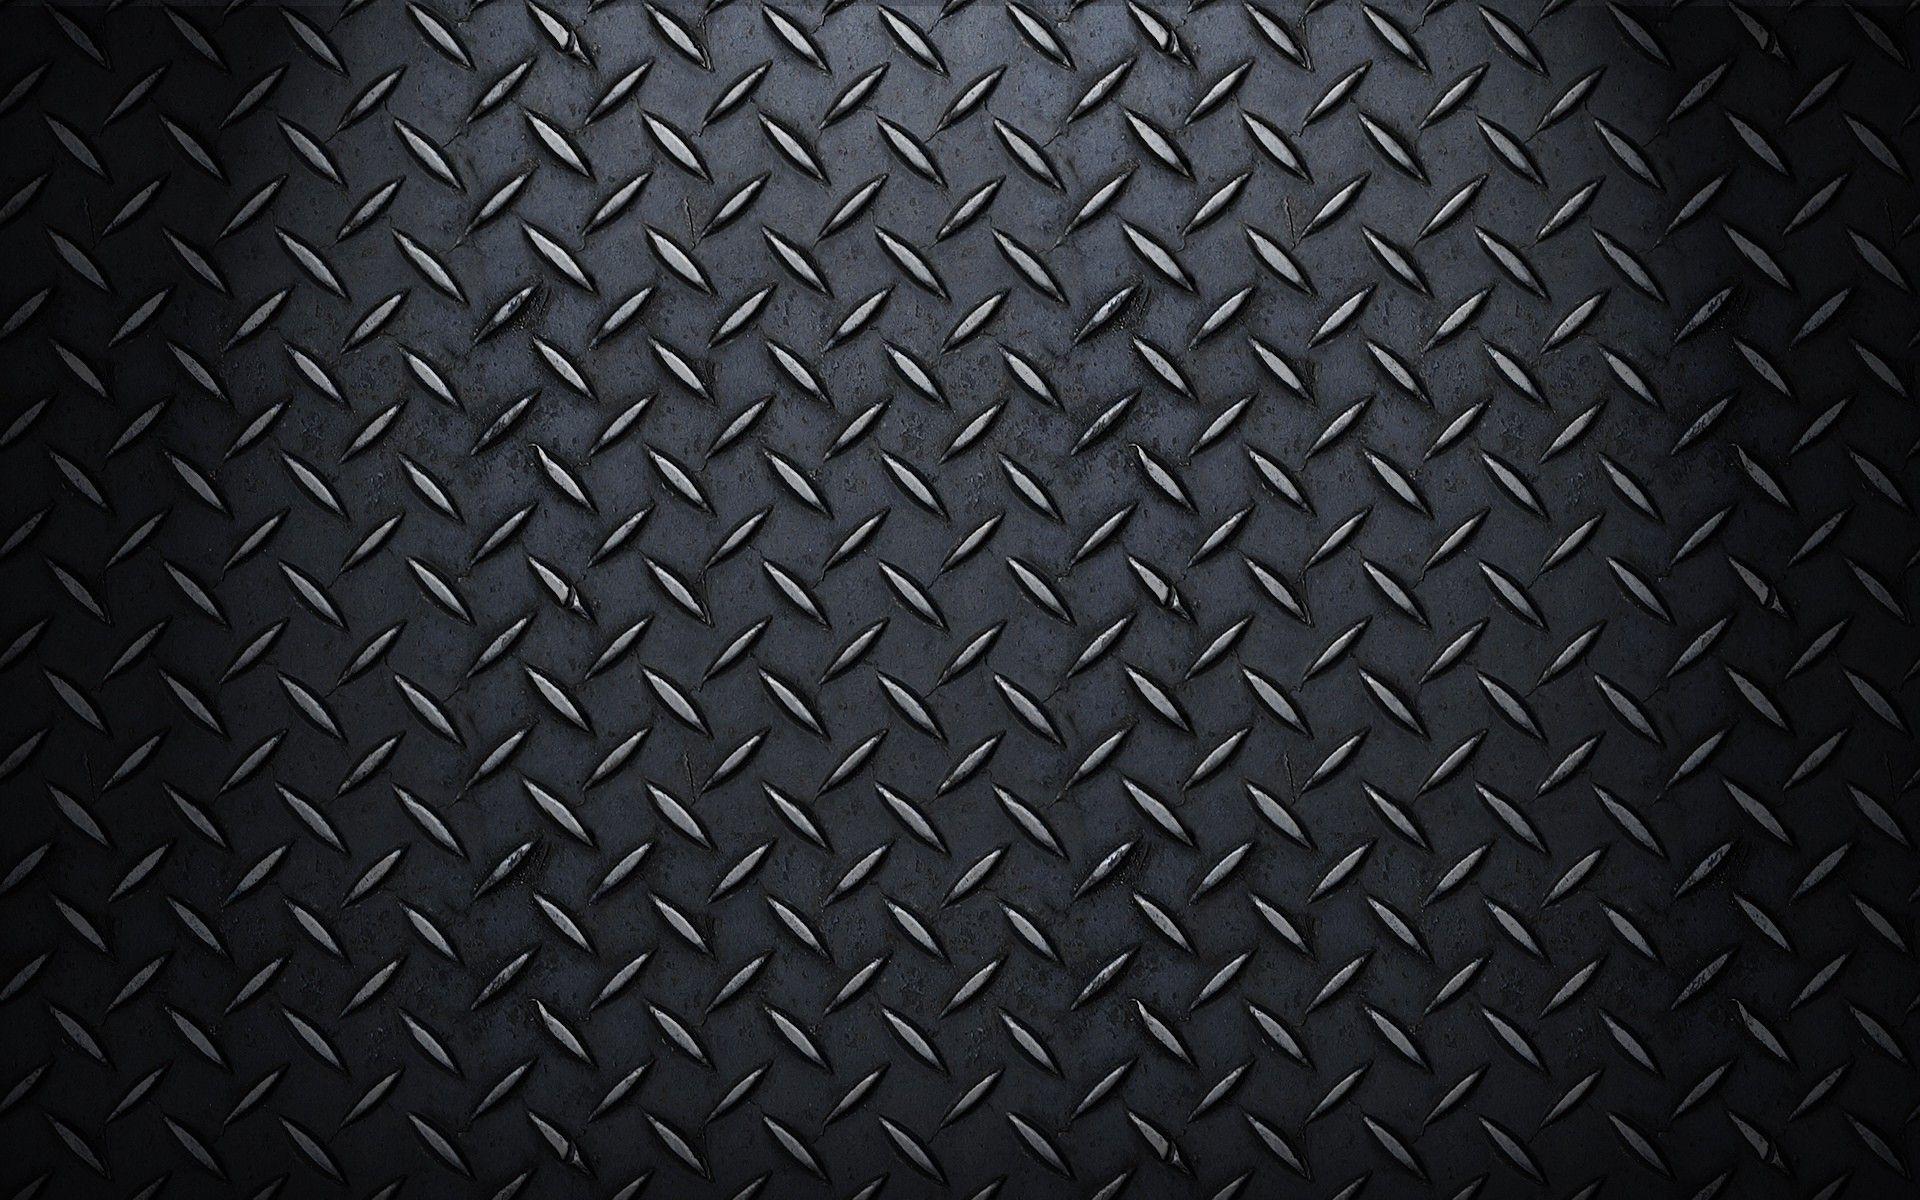 white carbon fiber background